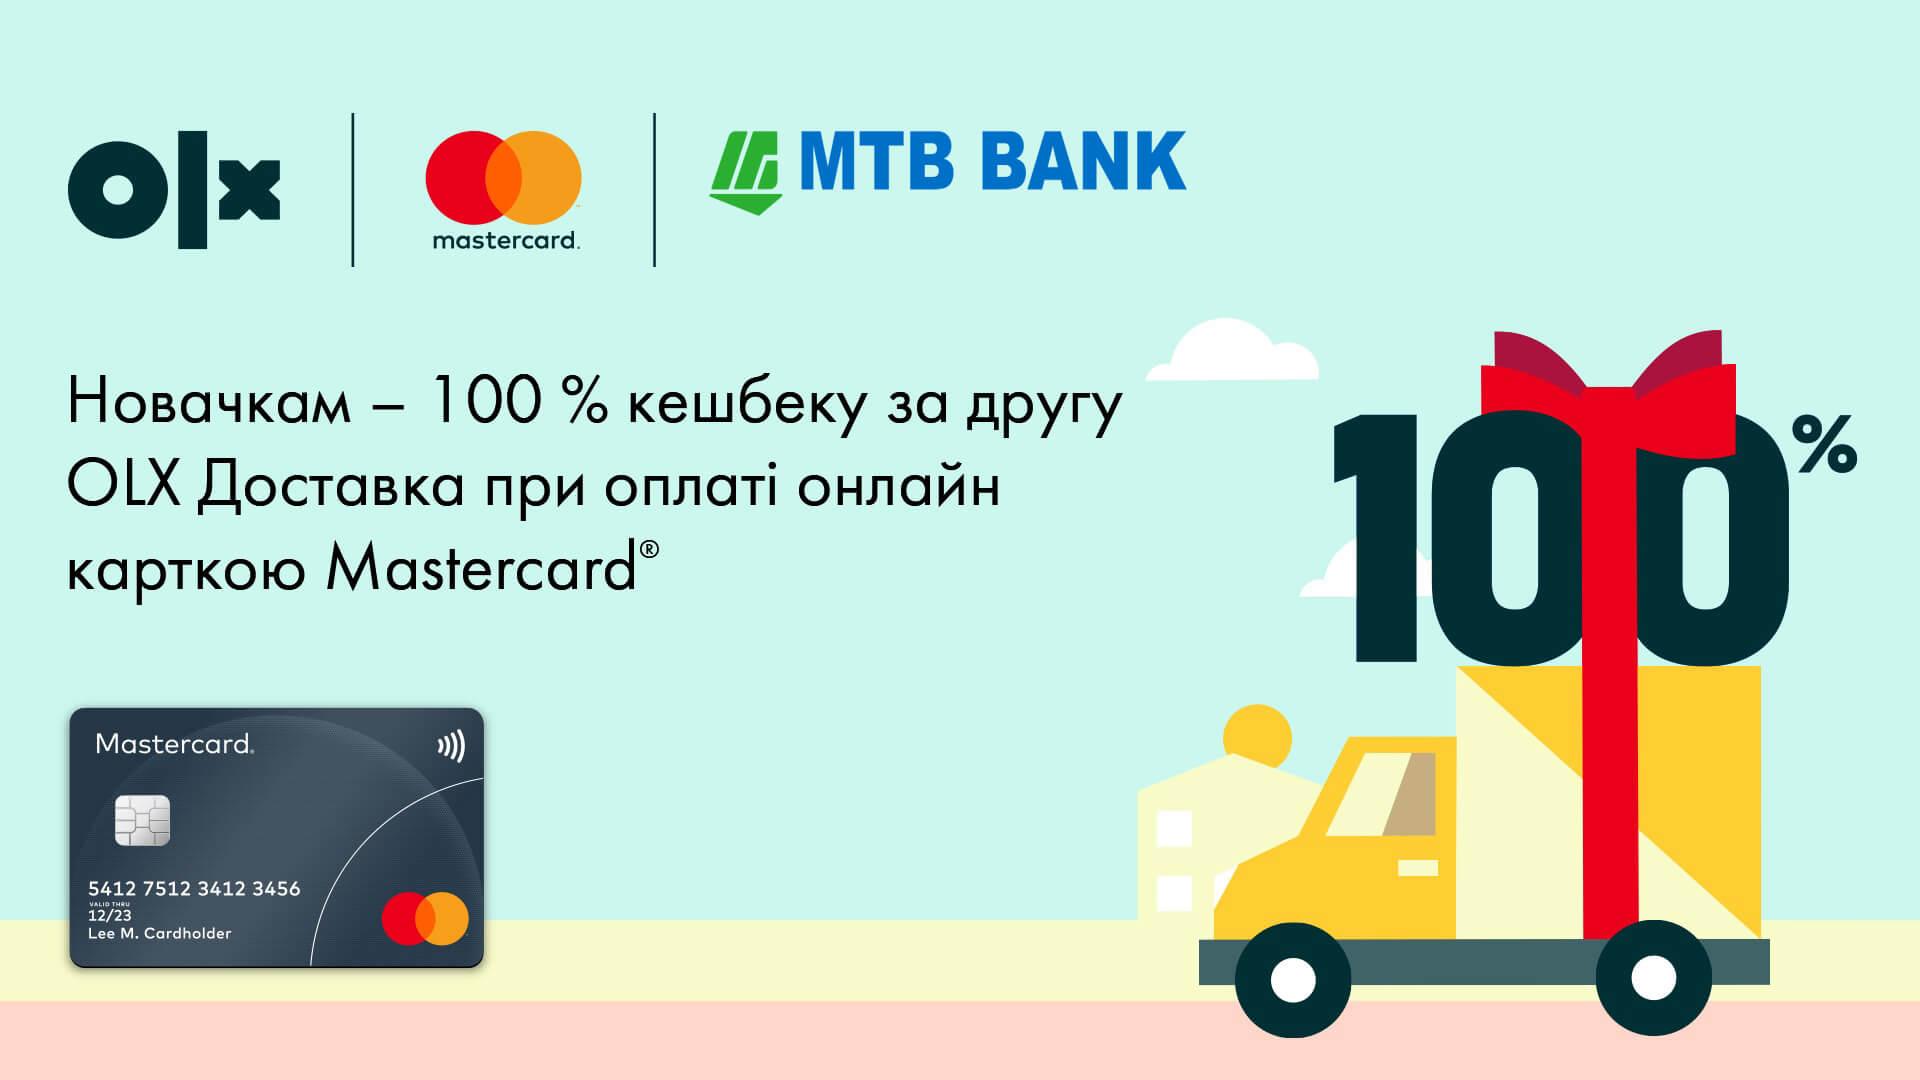 OLX - 100% кэшбек новичкам за вторую OLX Доставка из вашей Mastercard® - фото - mtb.ua